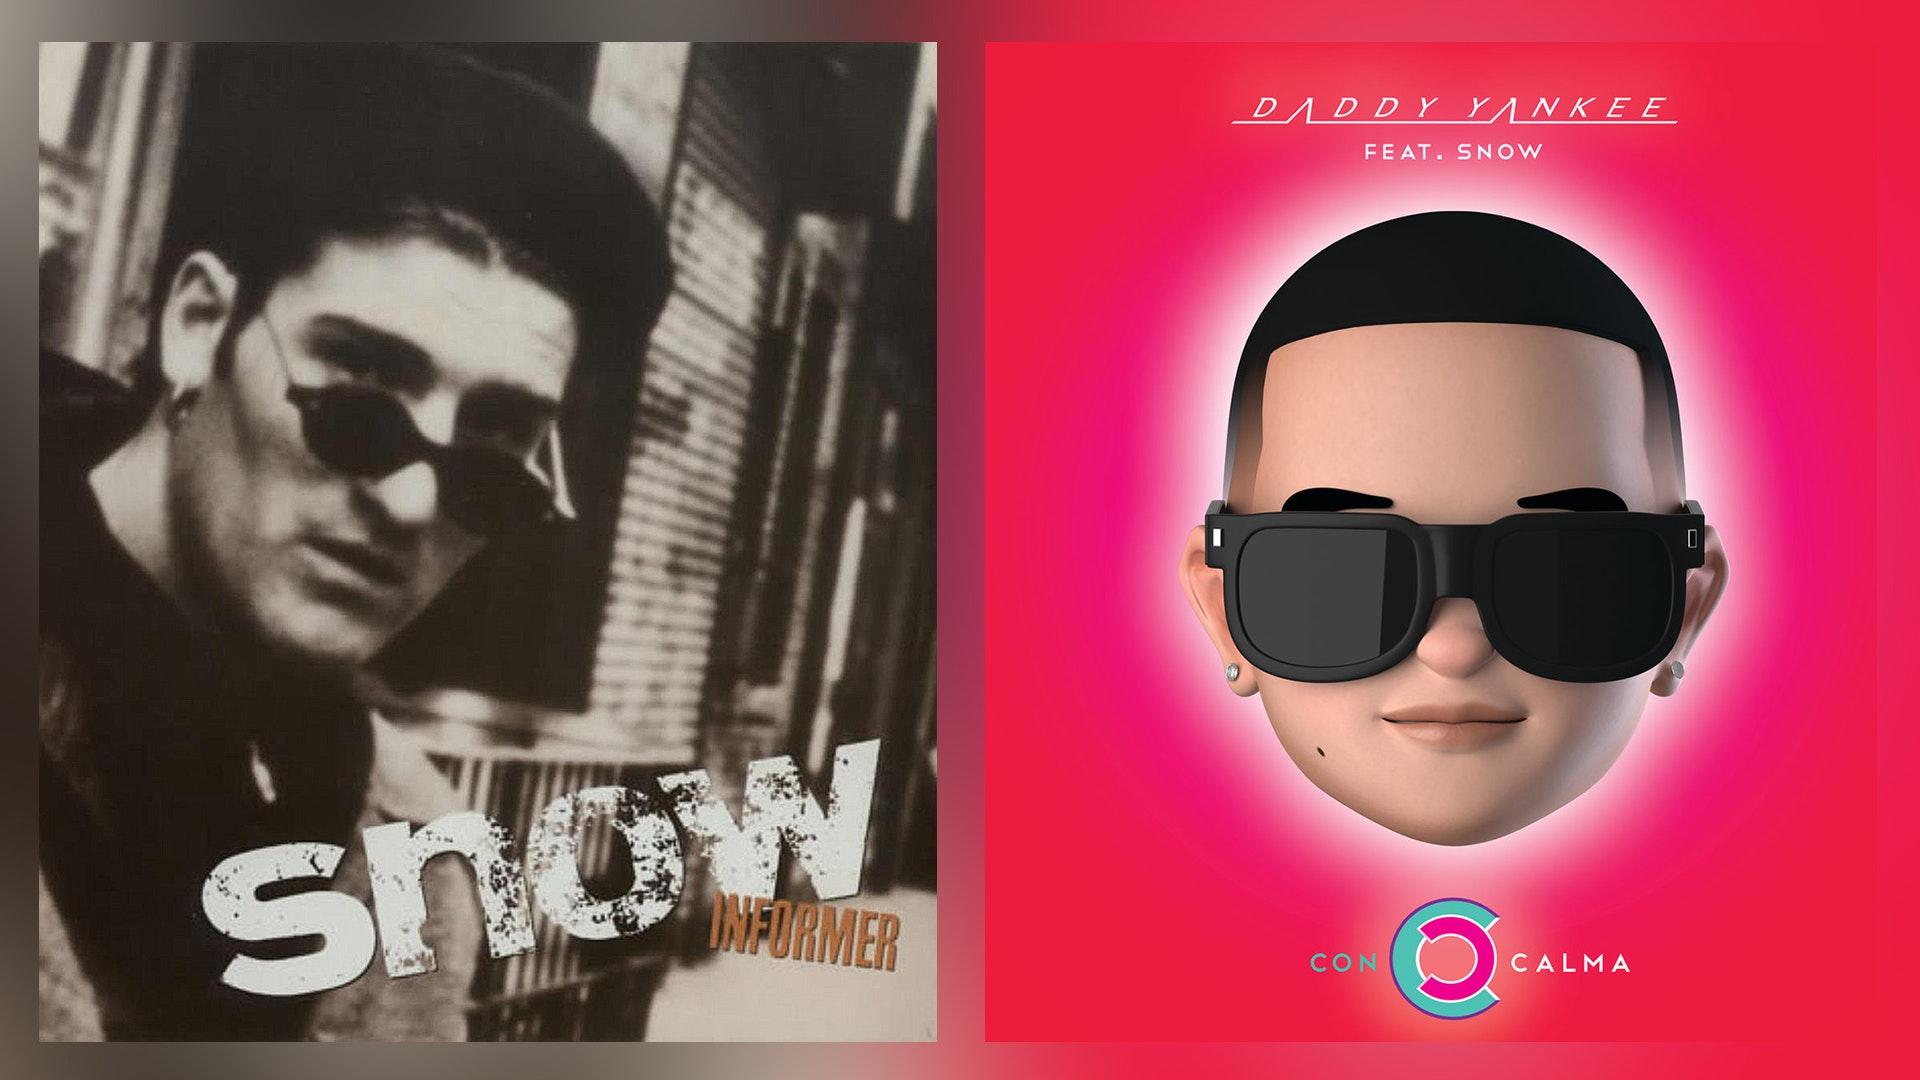 Snow & Daddy Yankee